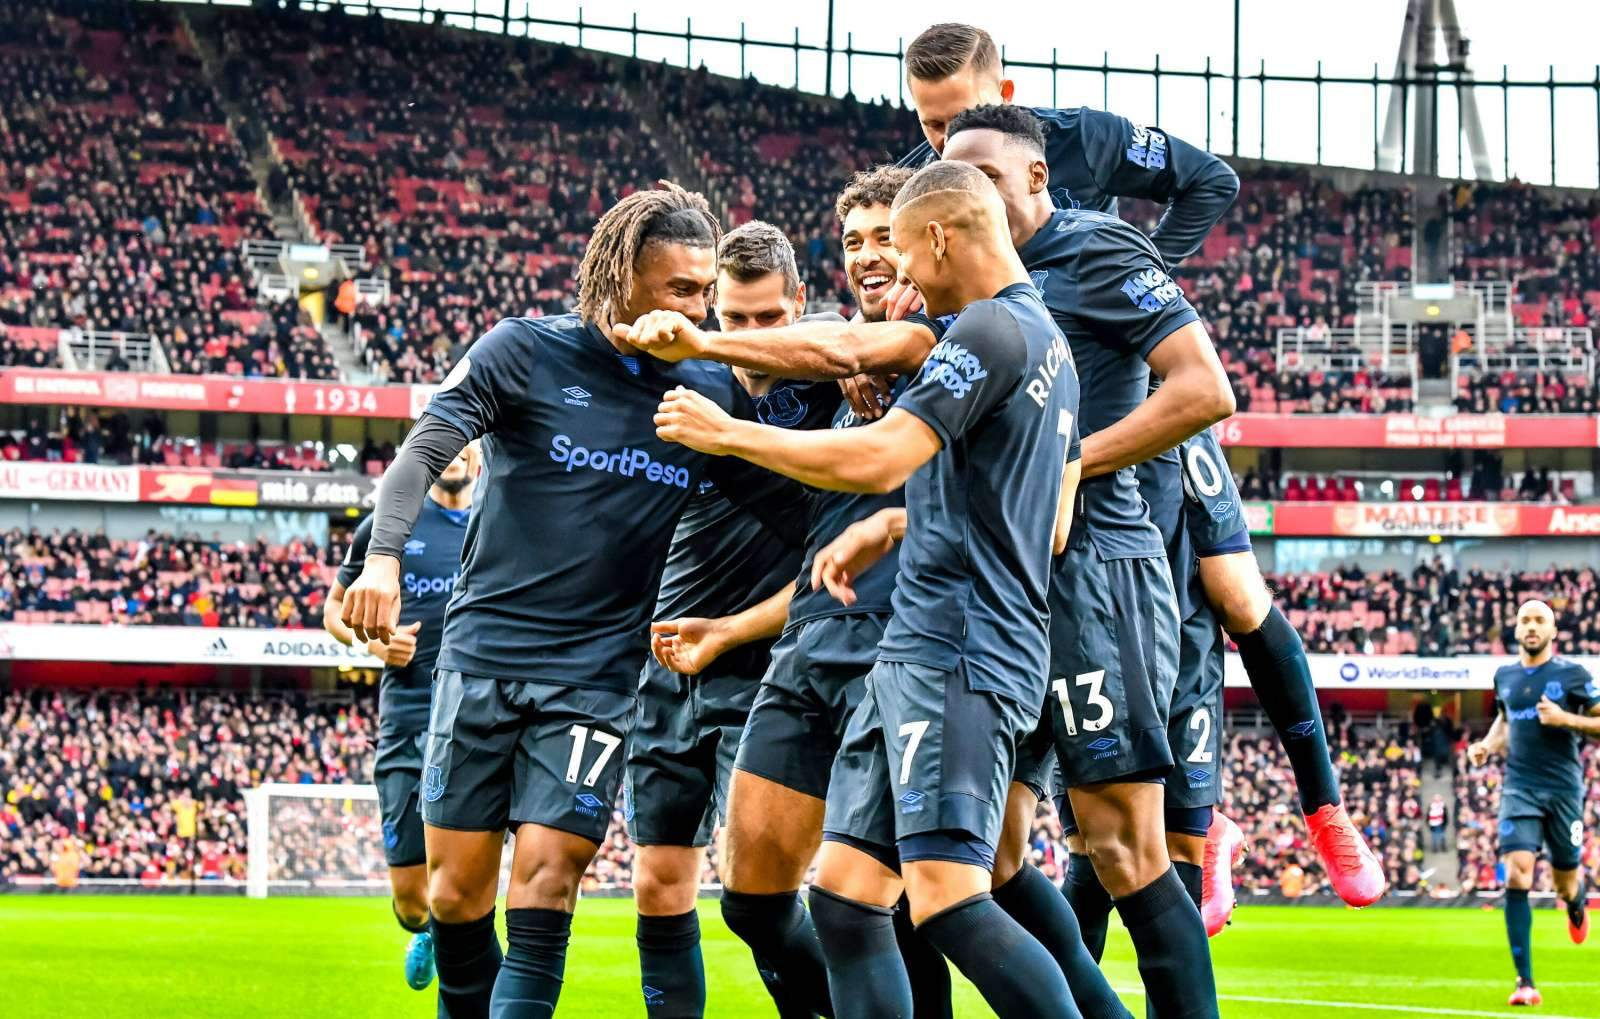 «Эвертон» - «Тоттенхэм»: прогноз на матч чемпионата Англии – 16 апреля 2021